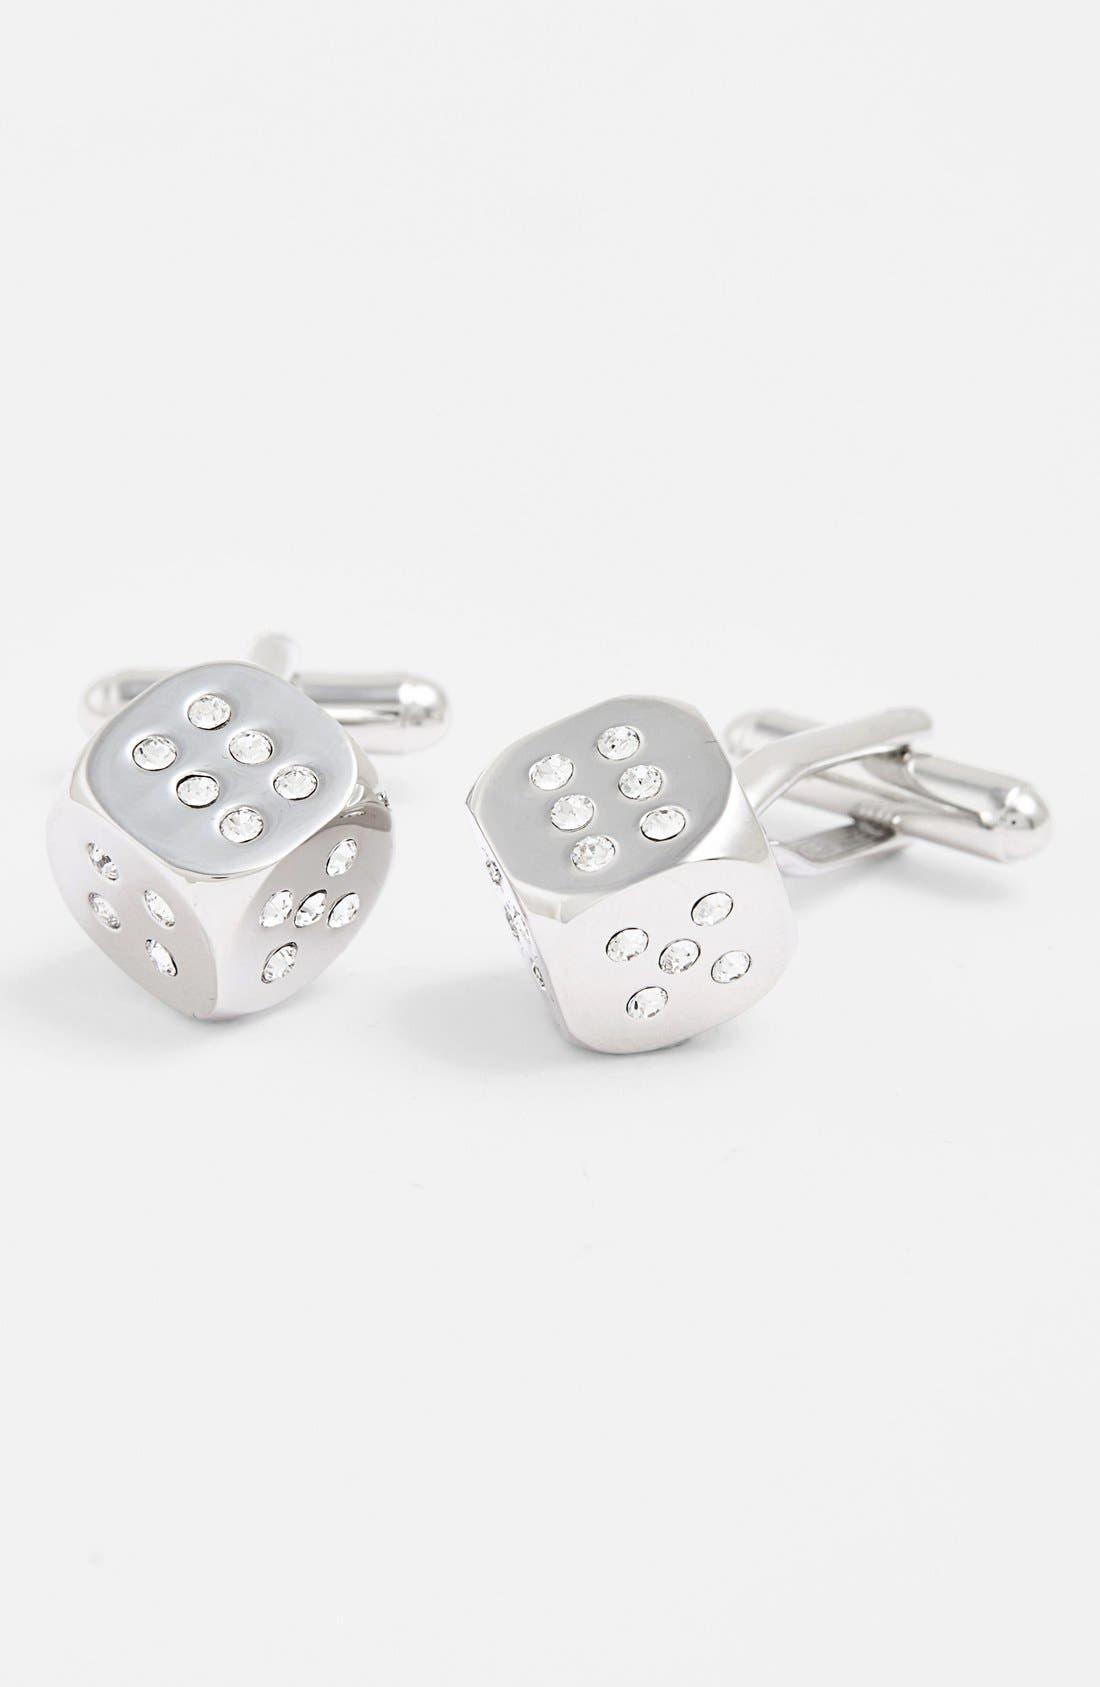 Dice Cuff Links,                         Main,                         color, Silver